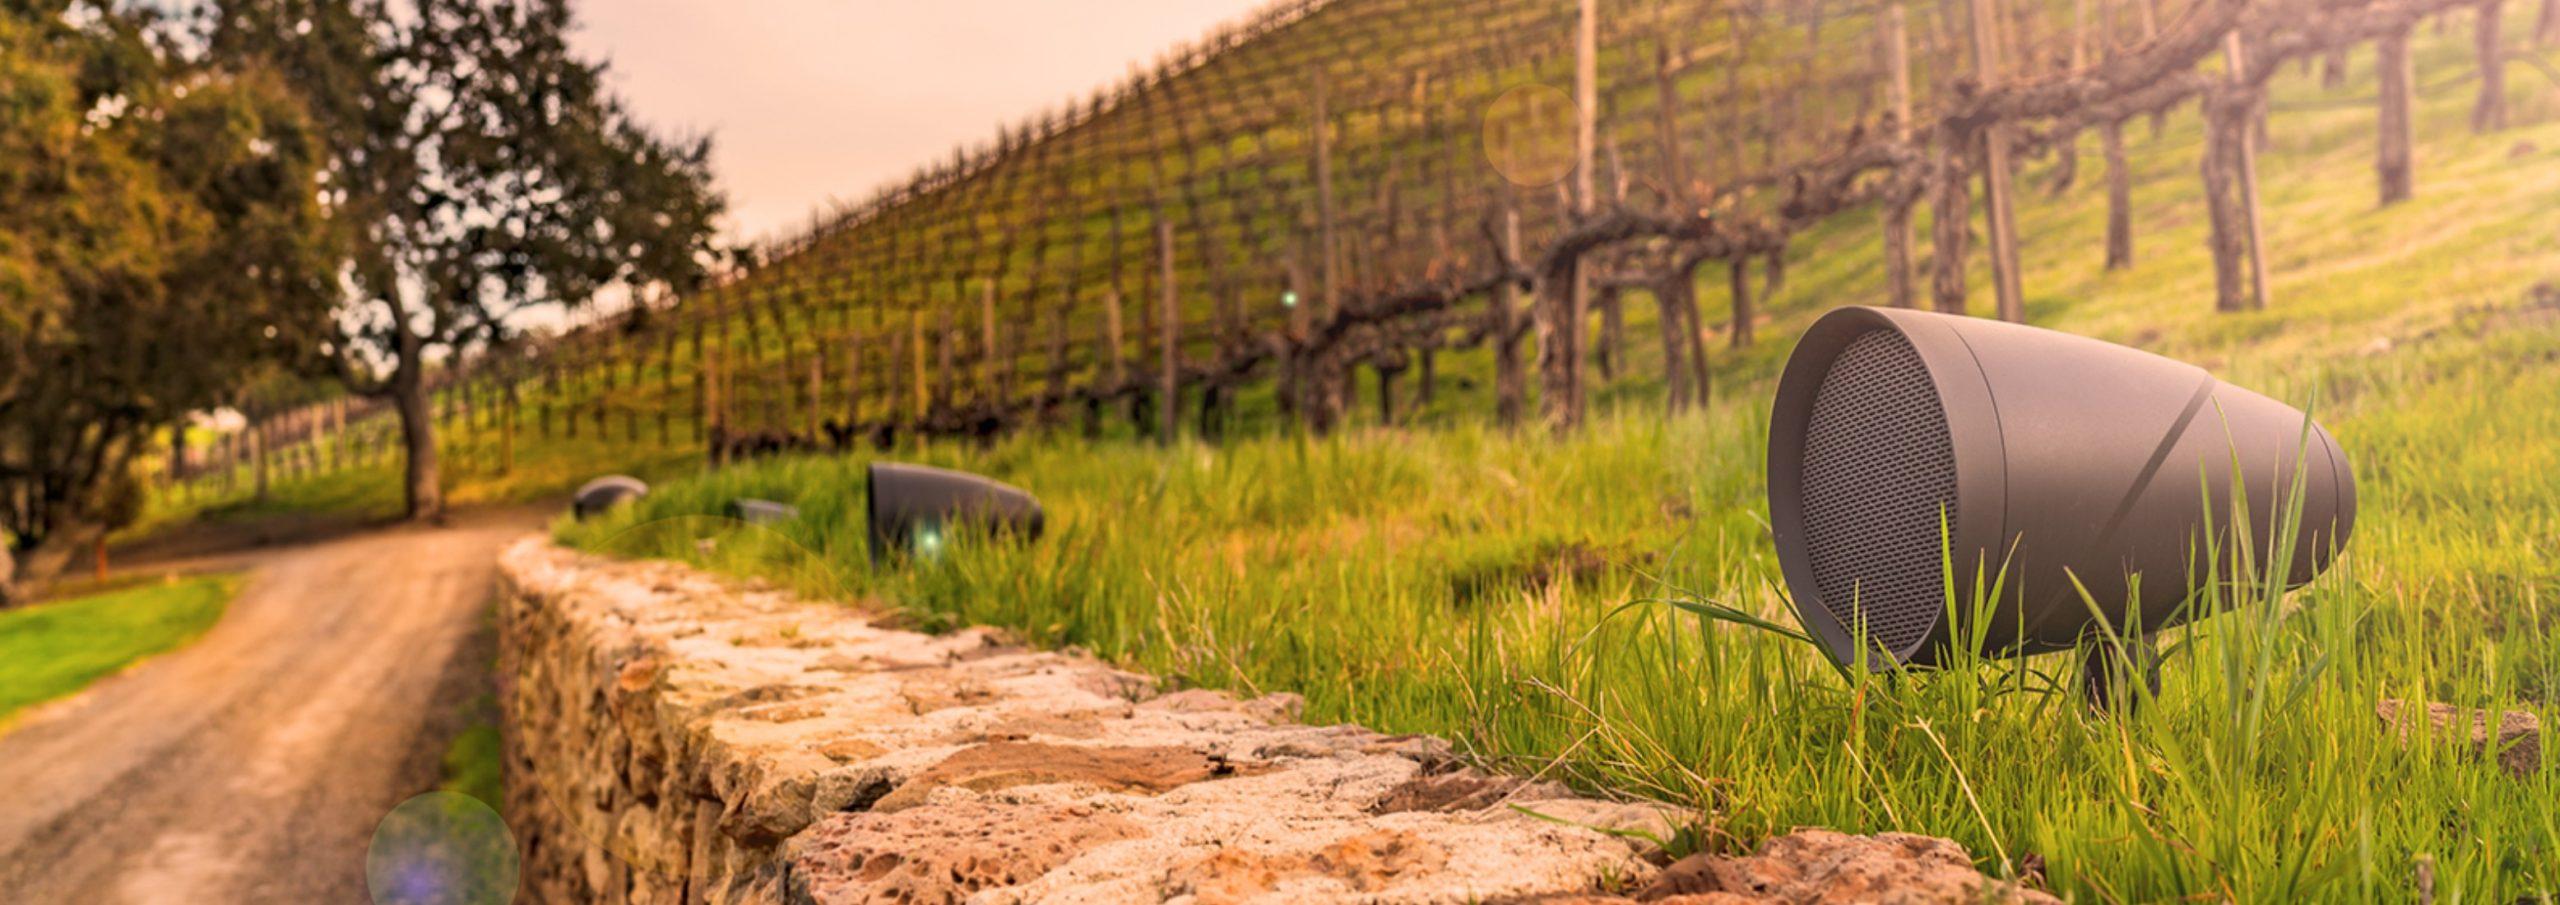 Sonance Takes A Wine Safari